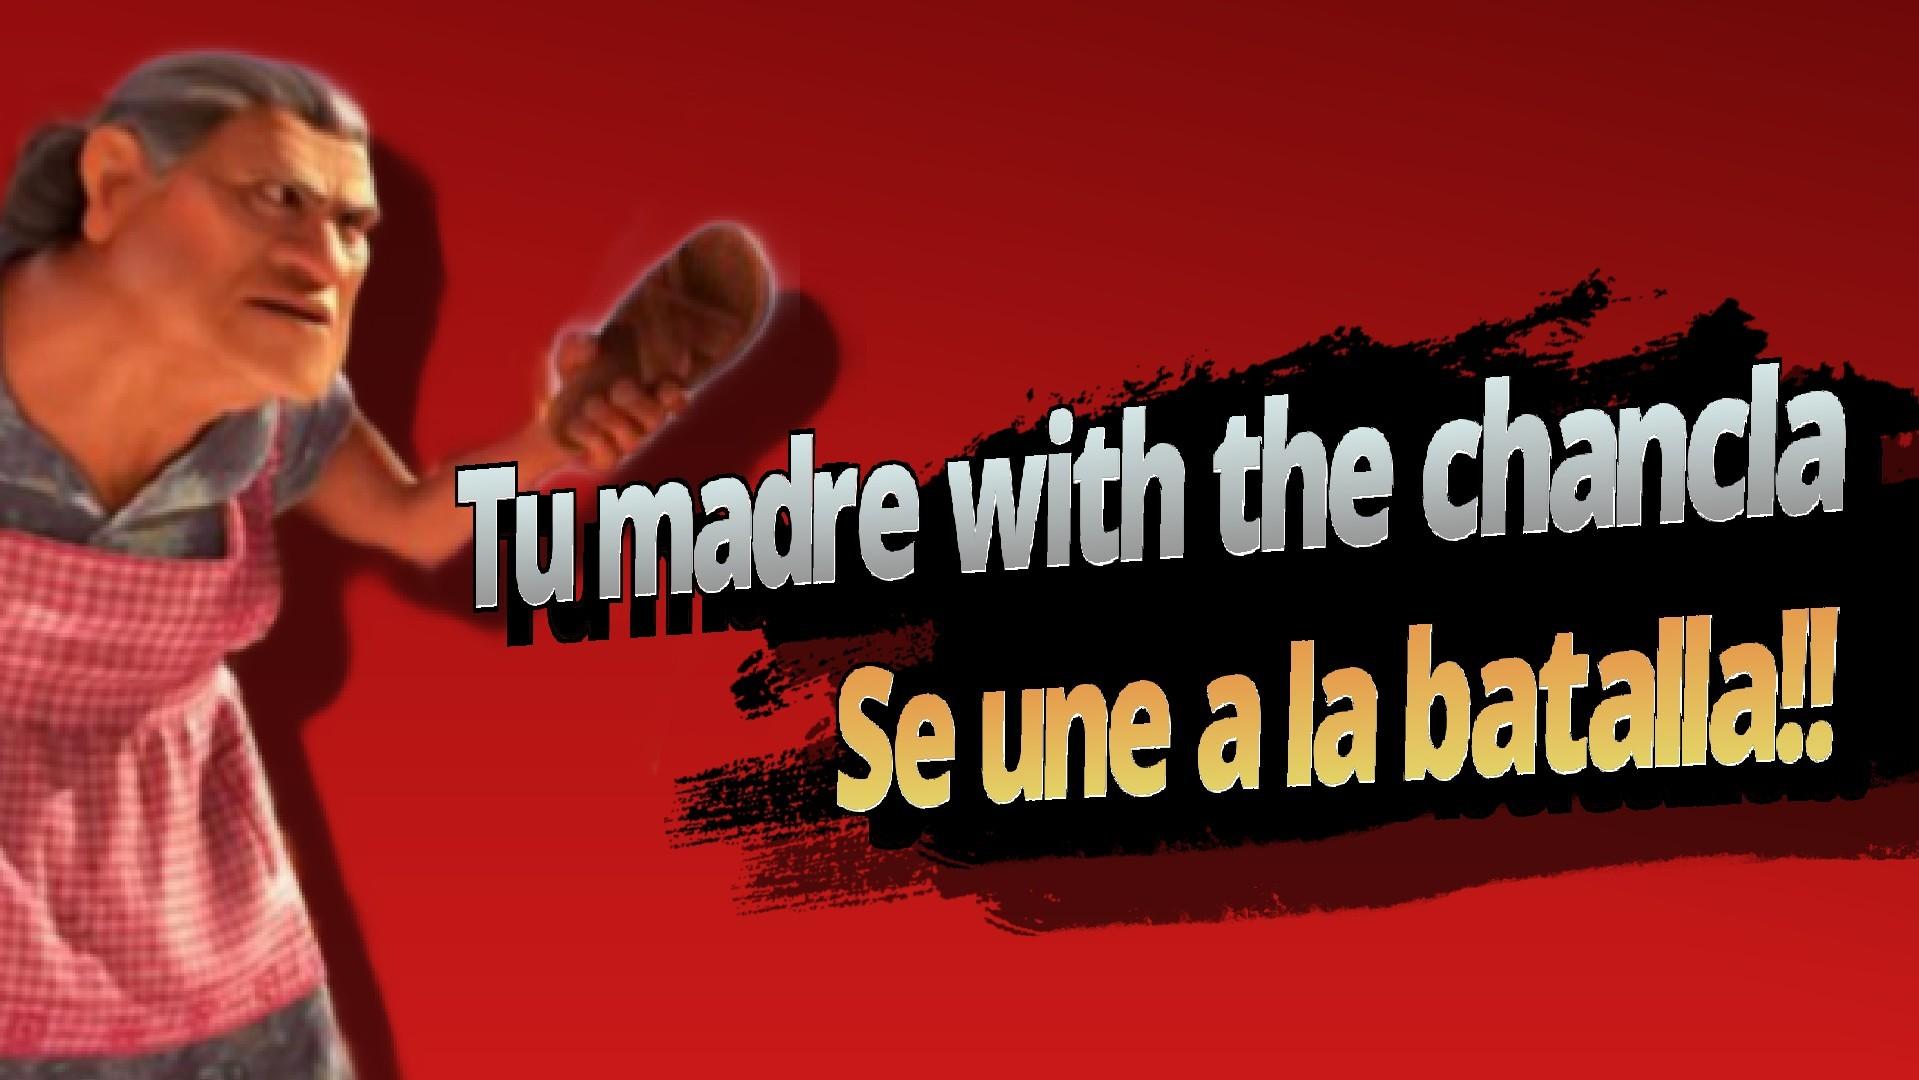 Tu madre se une a la batalla - meme